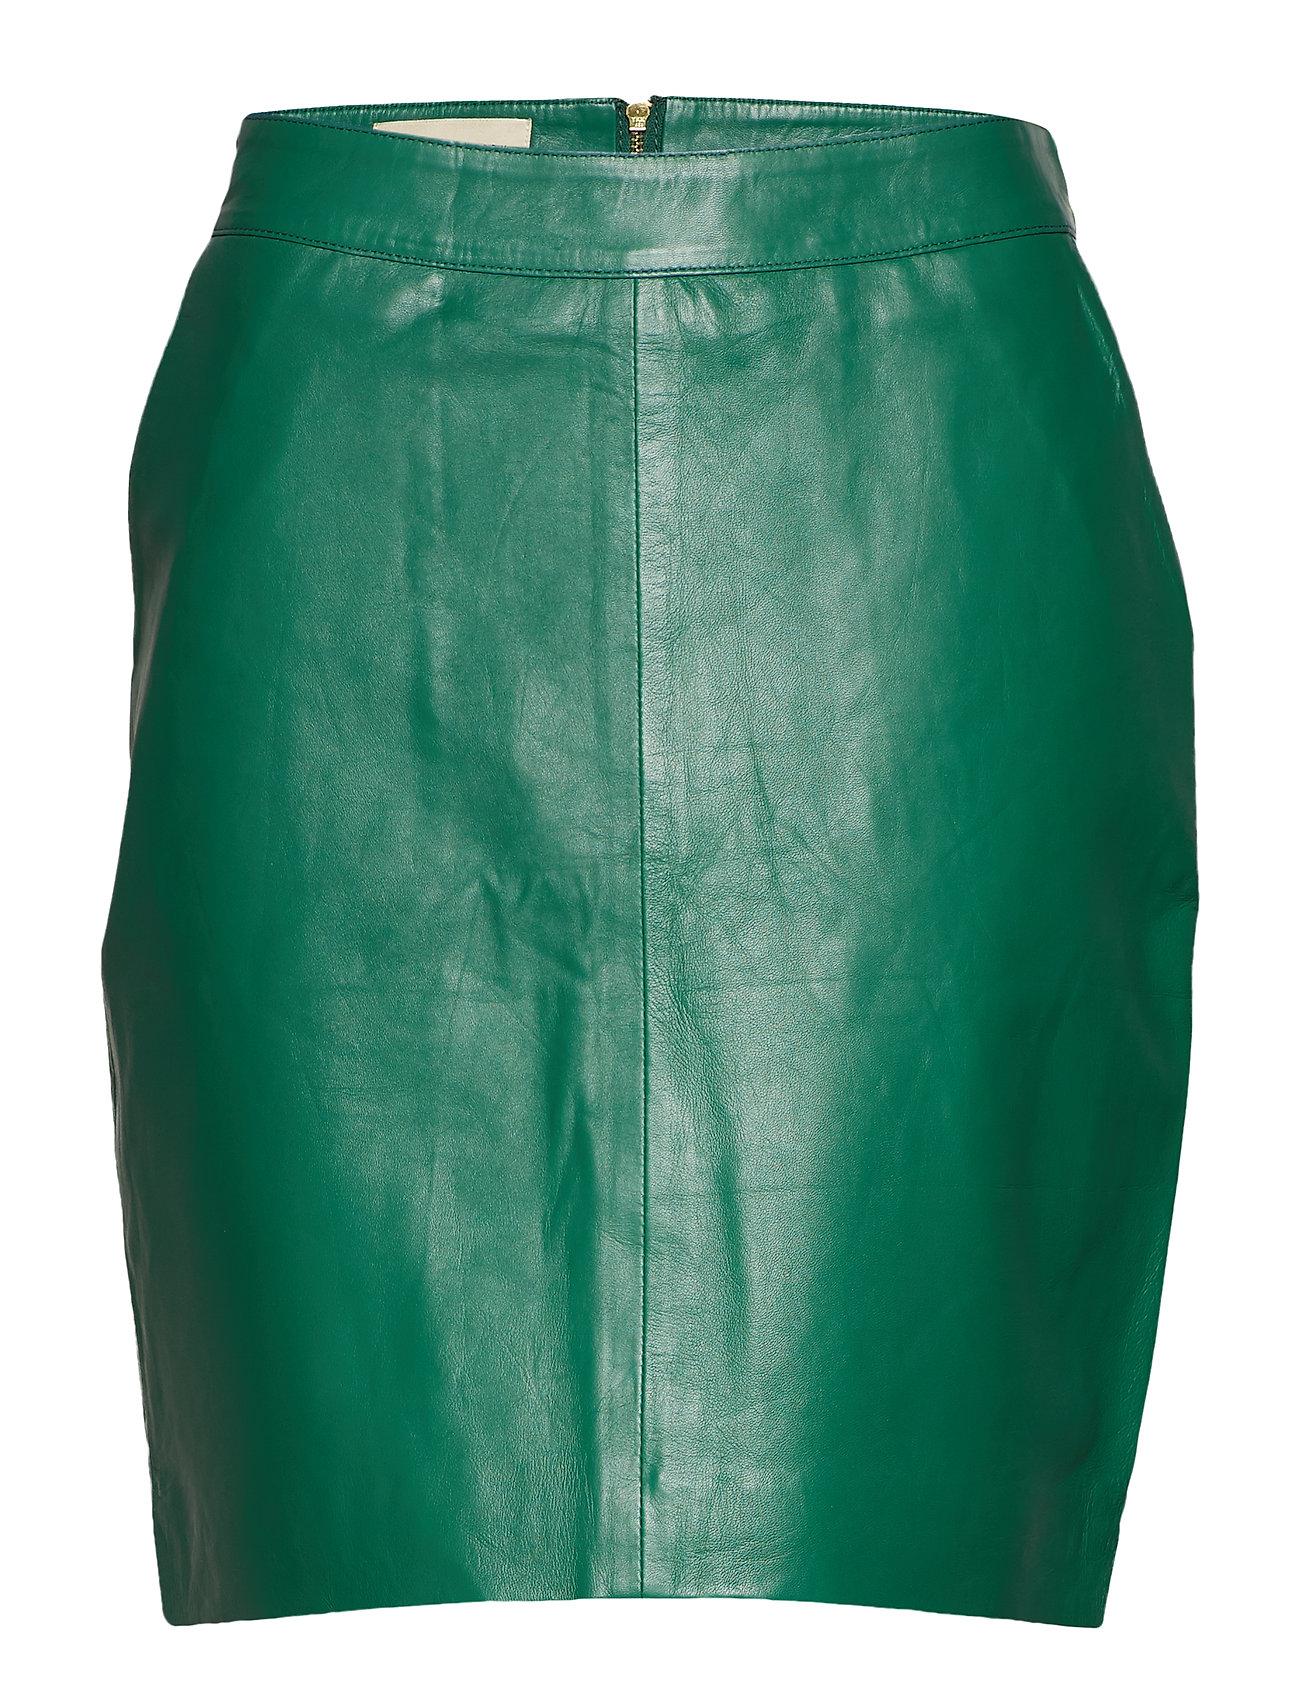 Lollys Laundry Aqua Skirt - GREEN